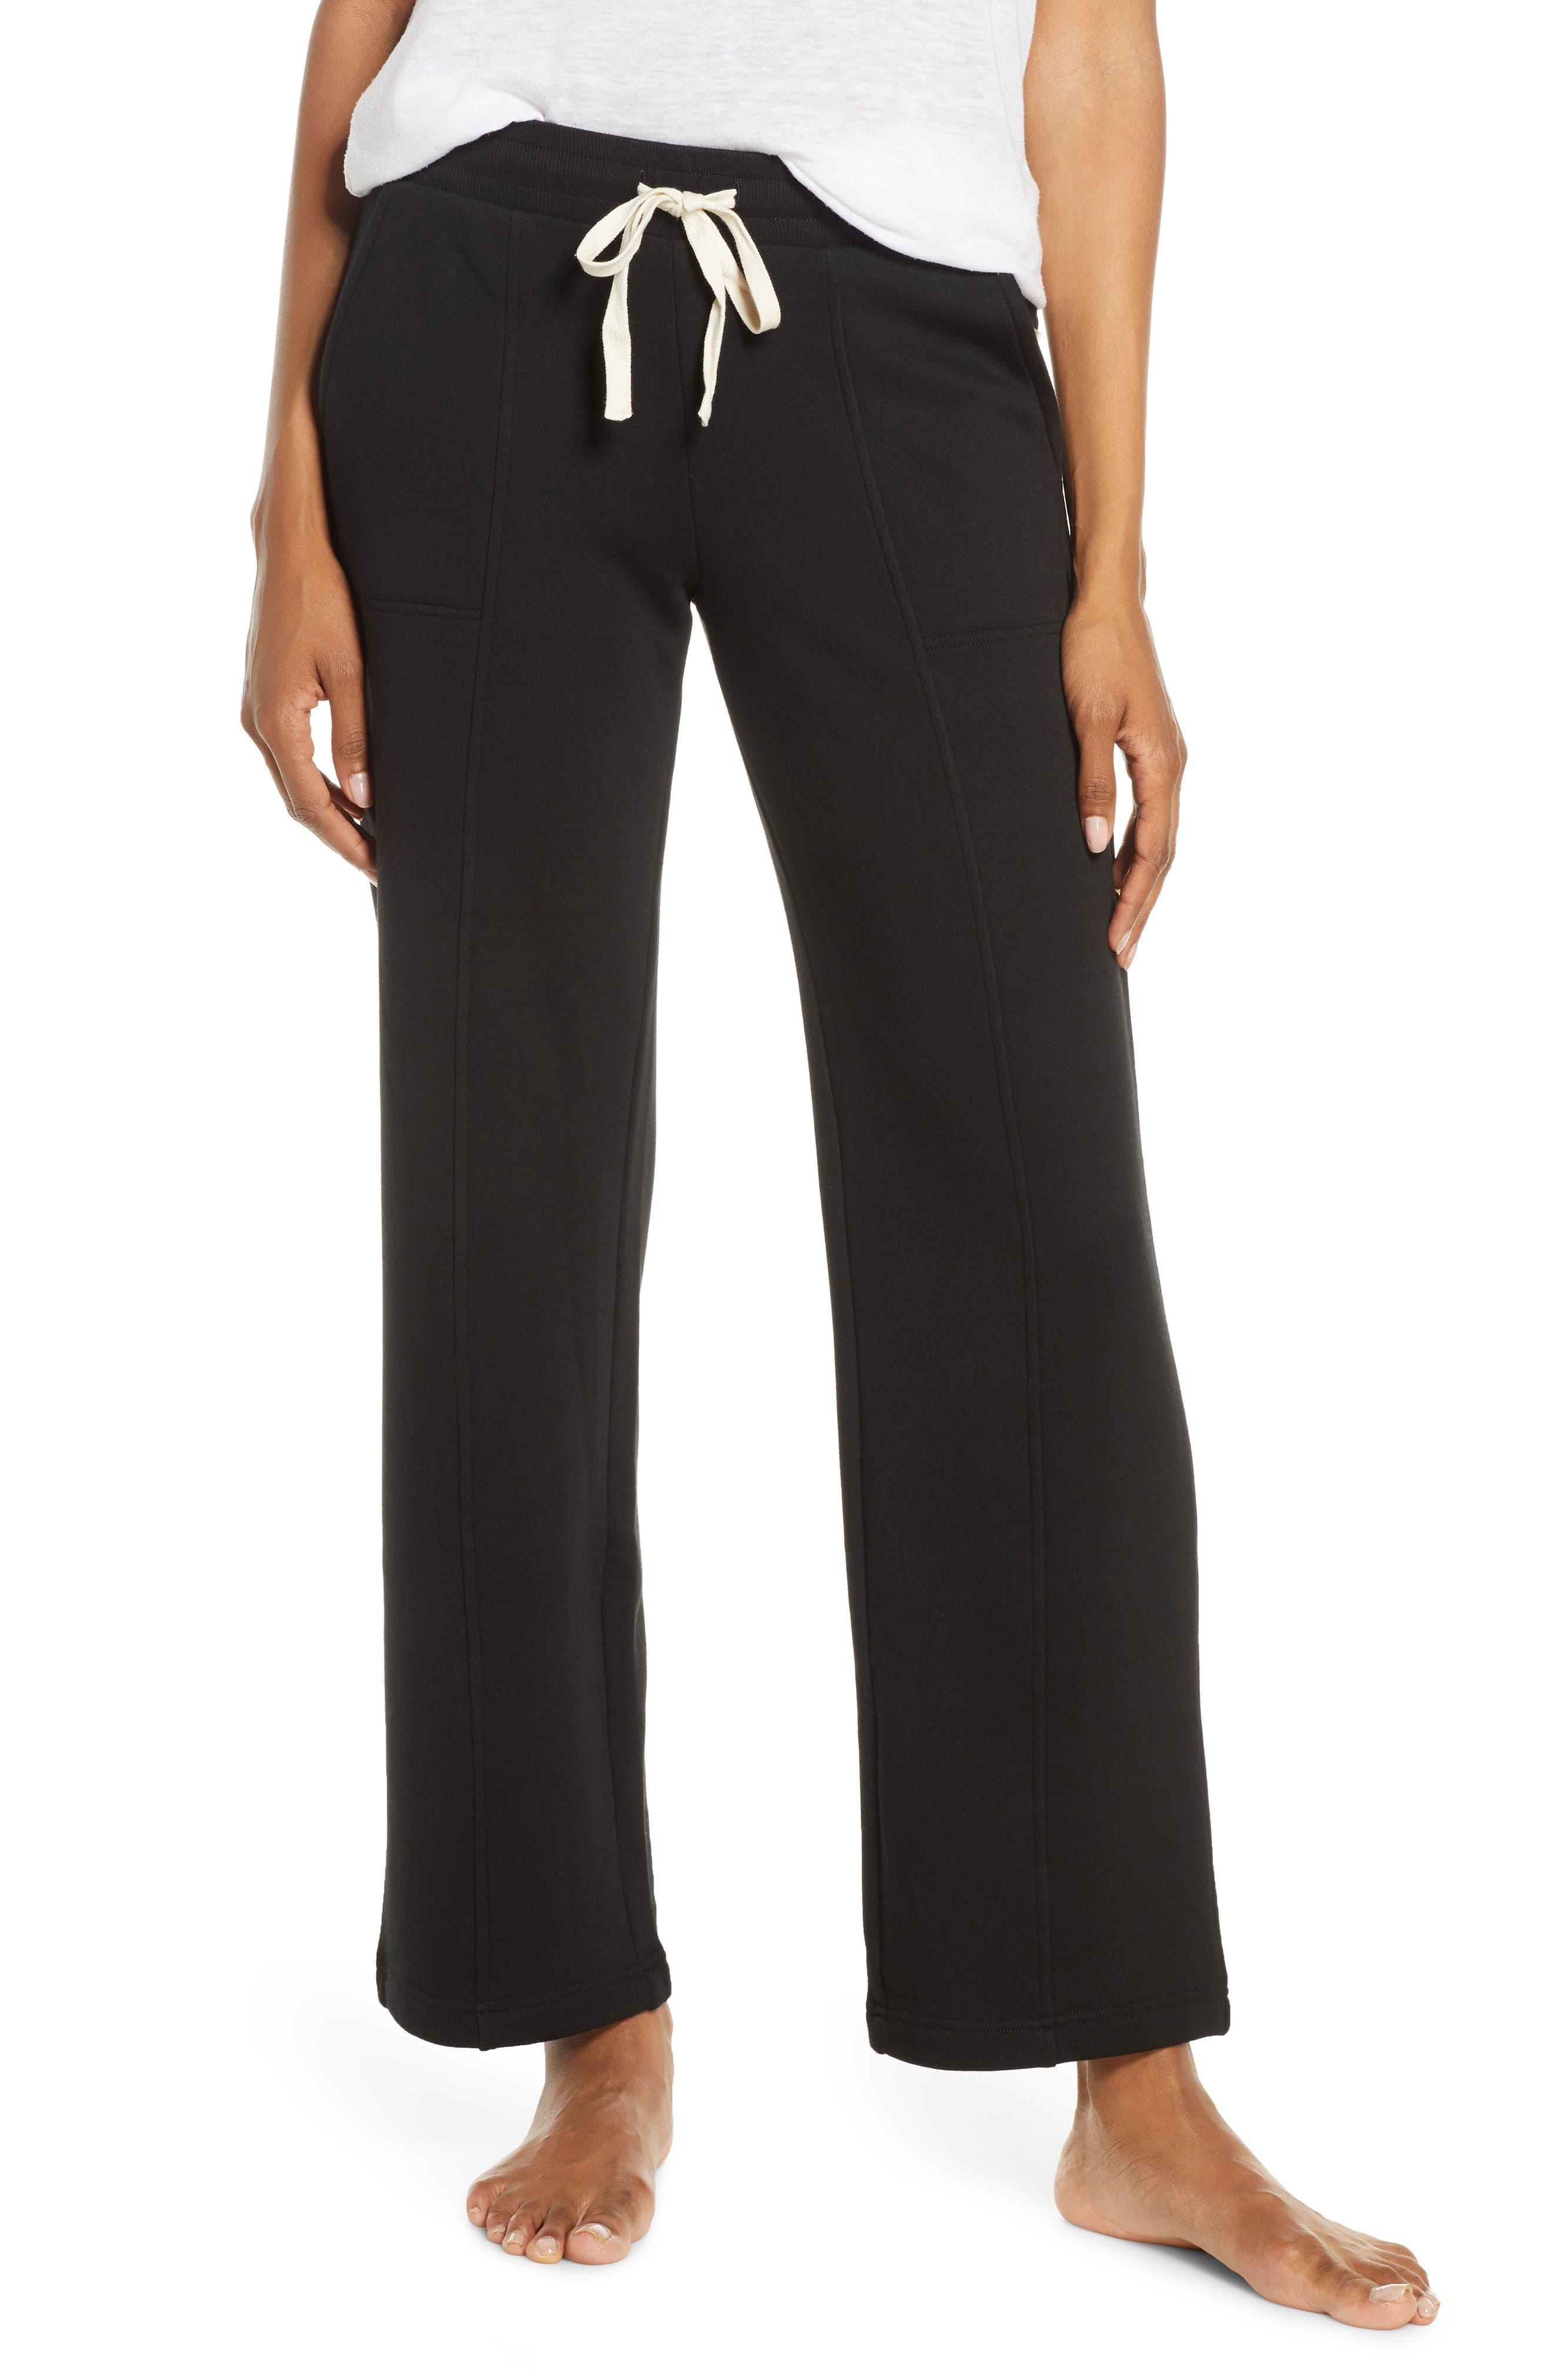 Women's Ugg Shannon Double Knit Lounge Pants